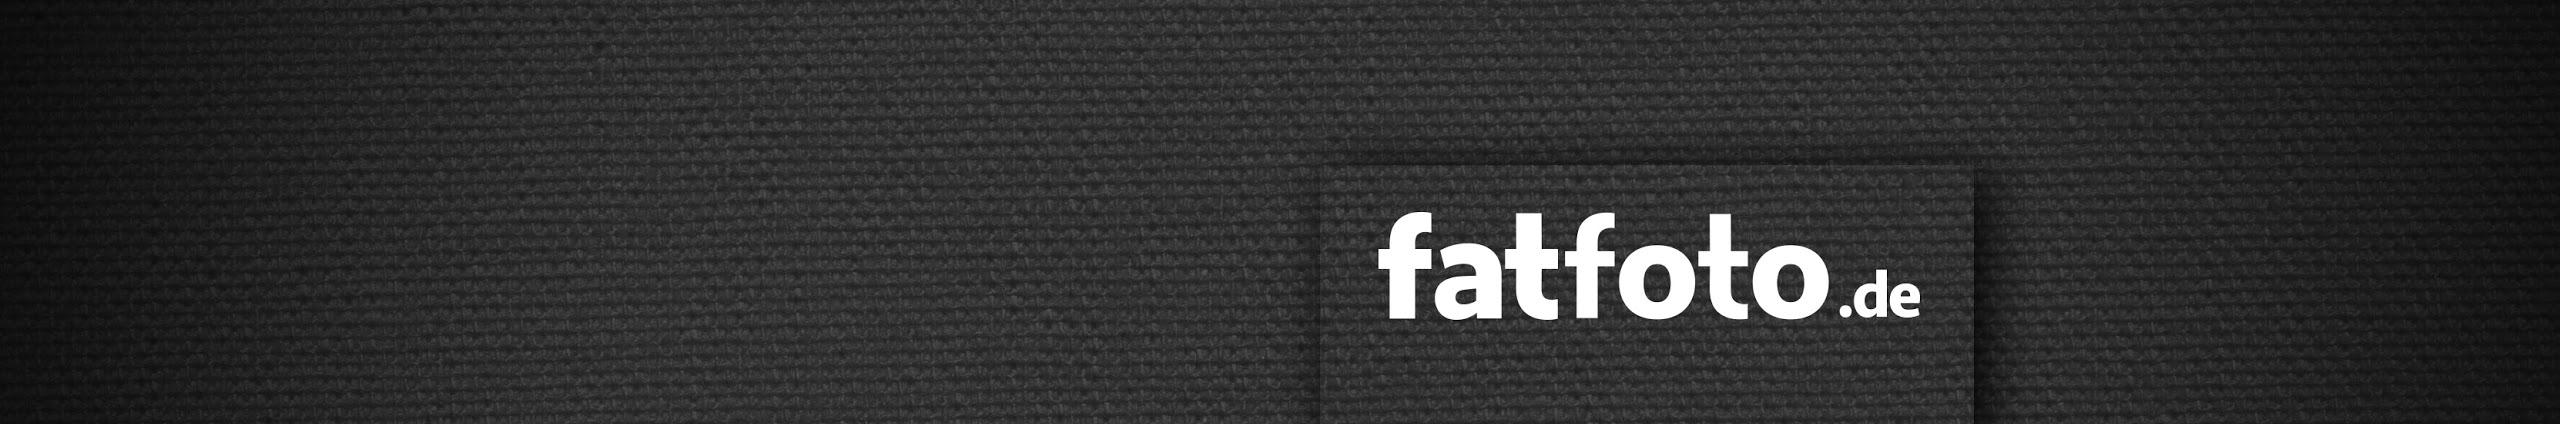 fatfoto_banner